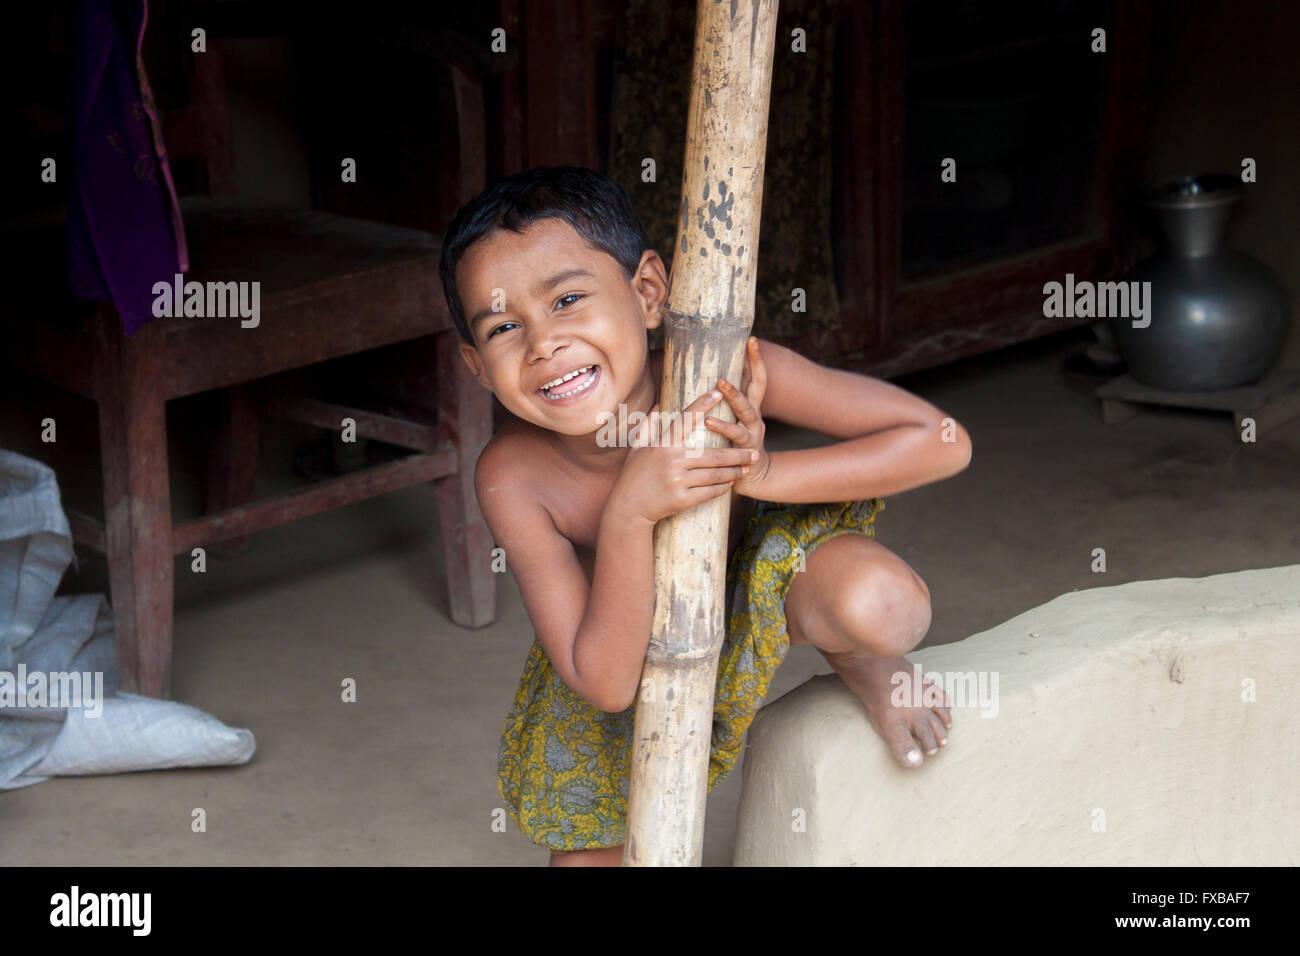 A little girl smiling in the Vola District, Barishal, Bangladesh, Asia © Jahangir Alam Onuchcha/Alamy - Stock Image